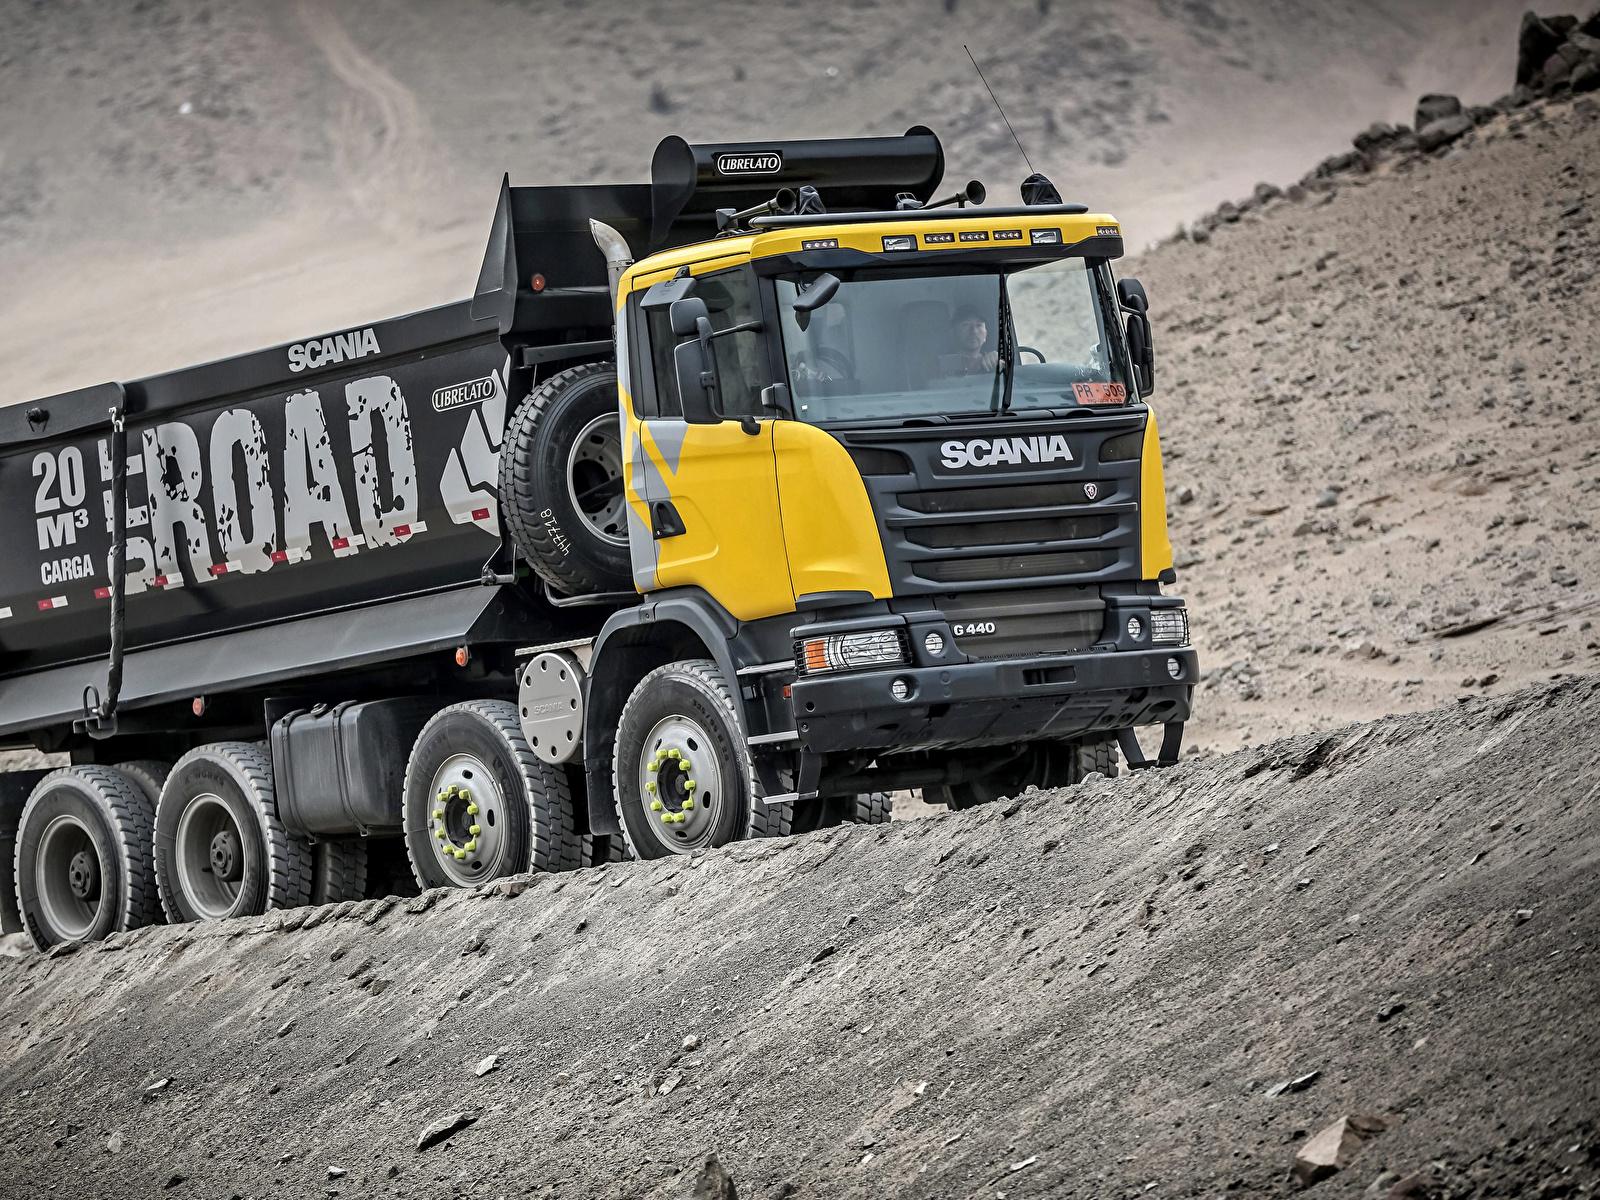 Photo lorry Scania 8x4, G440, 2013 Cars 1600x1200 Trucks auto automobile